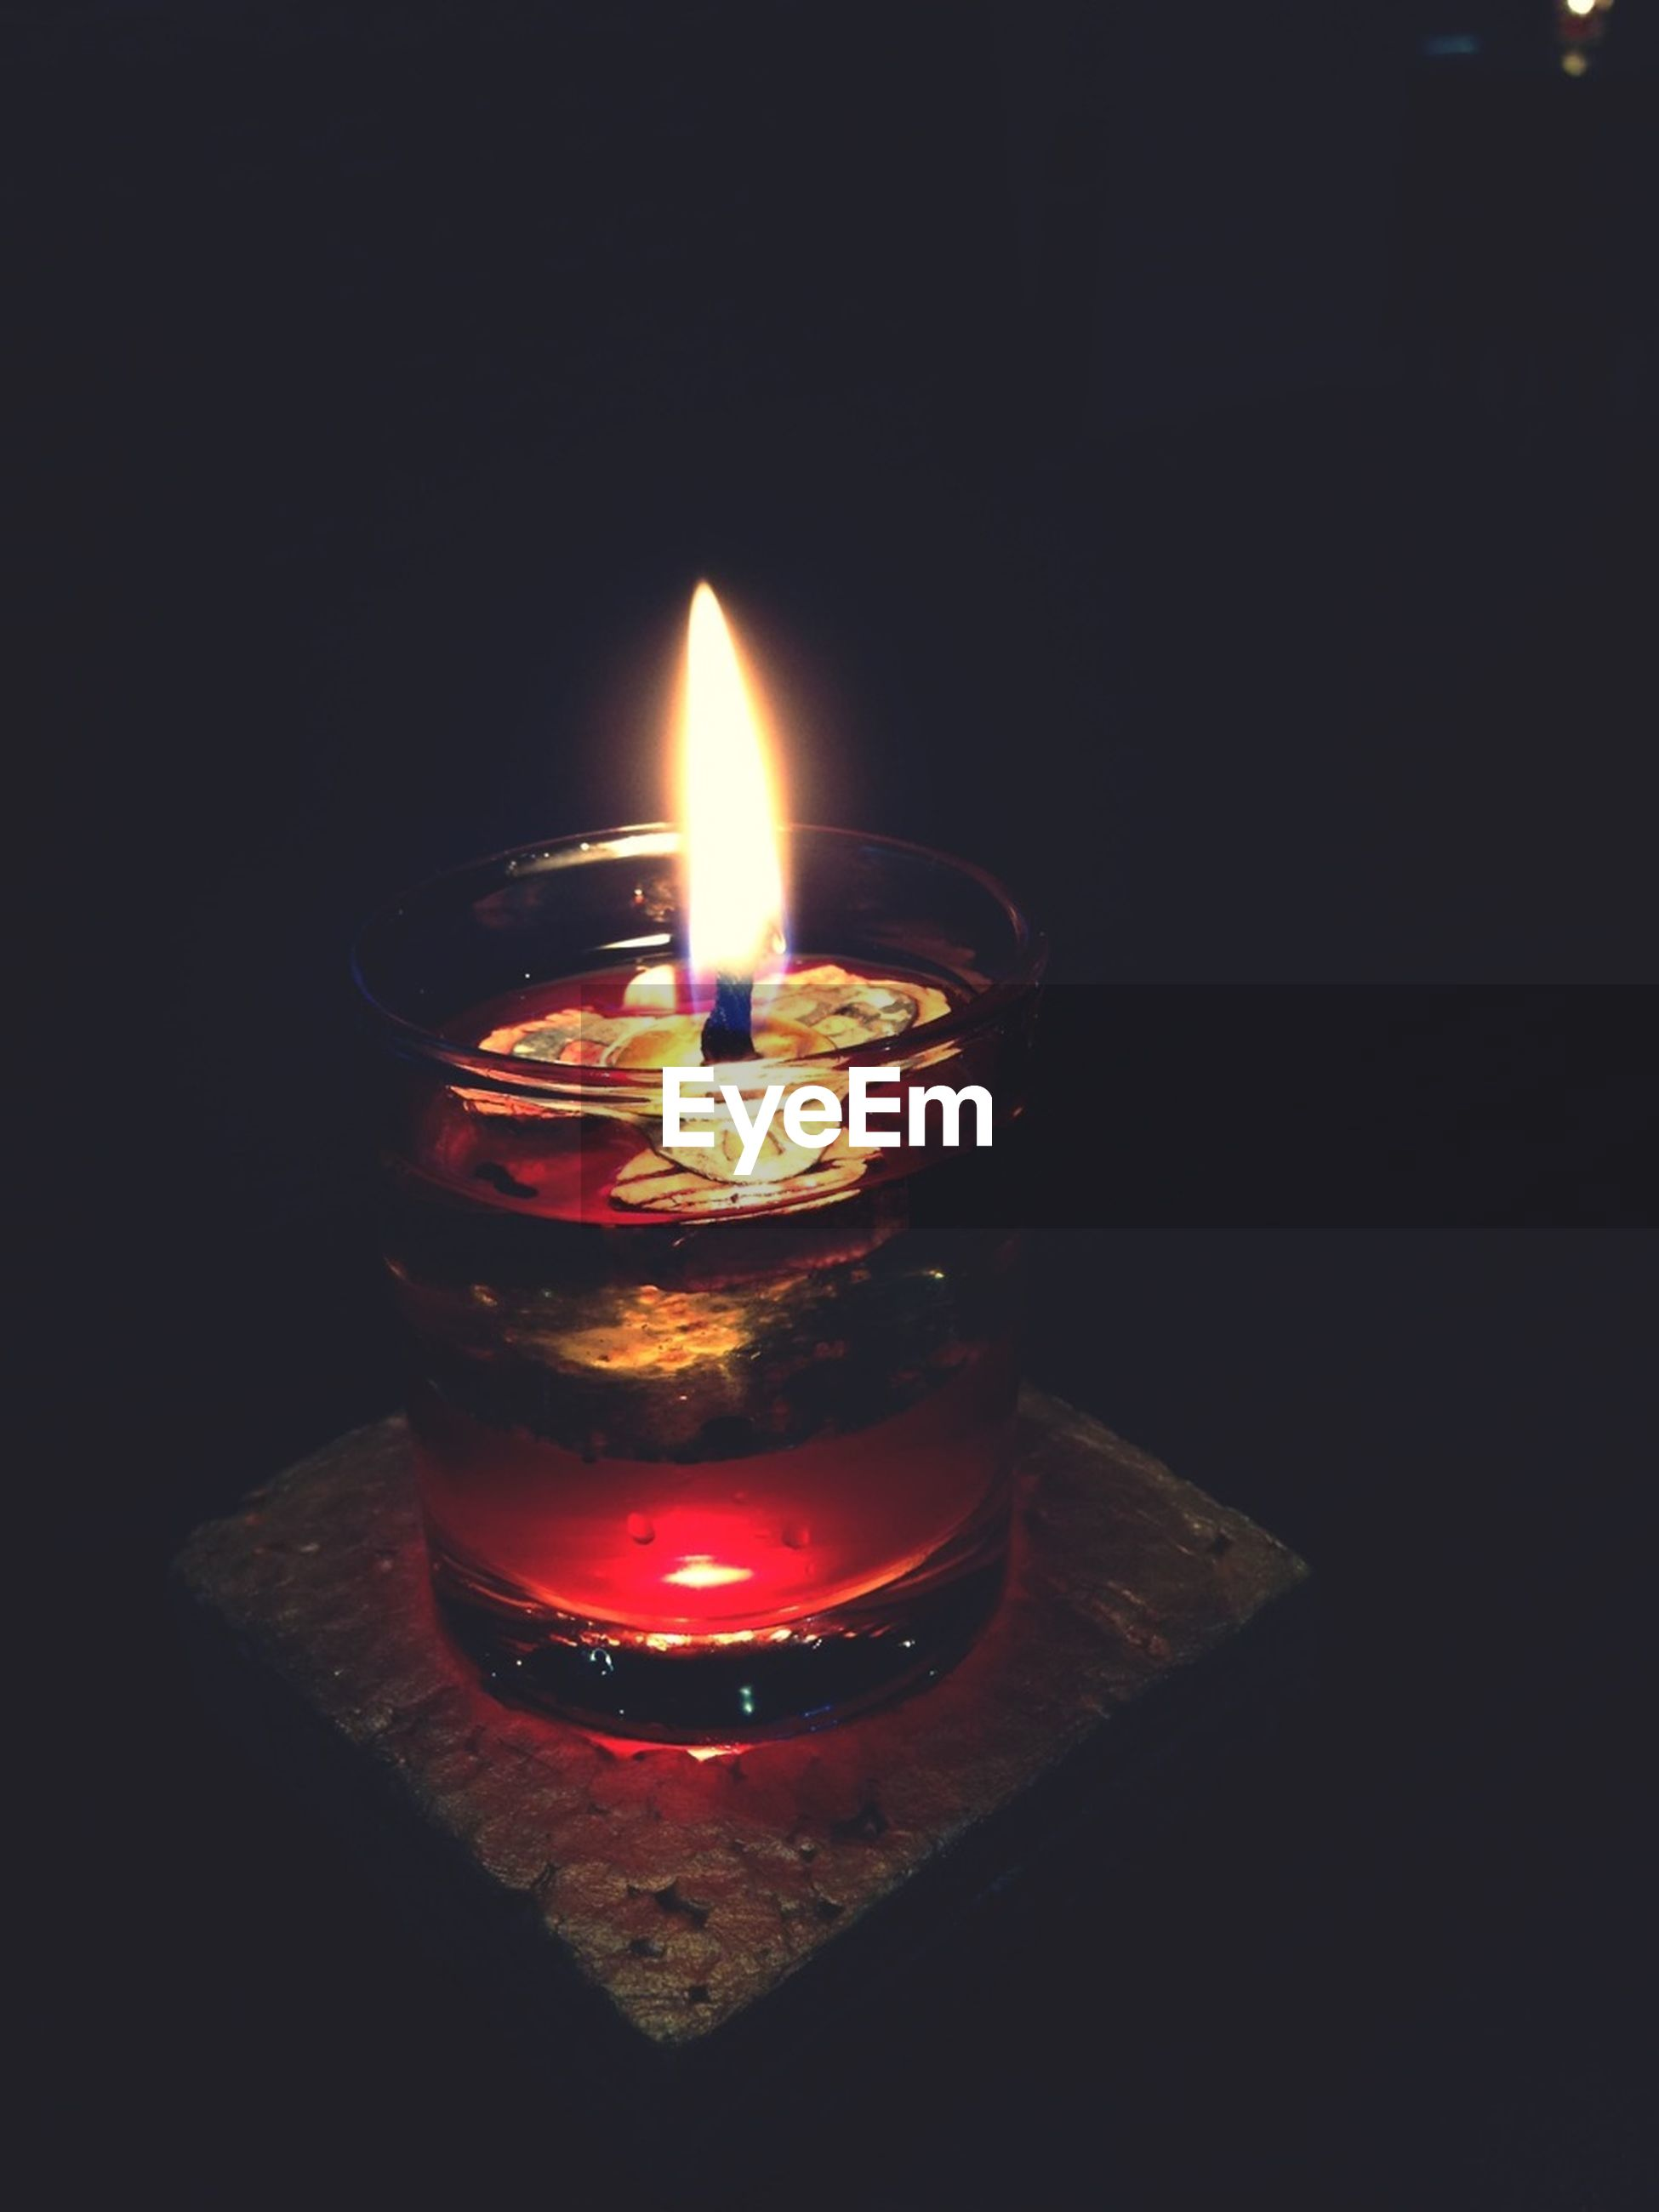 flame, burning, candle, fire - natural phenomenon, illuminated, glowing, heat - temperature, lit, indoors, candlelight, close-up, fire, dark, night, tea light, darkroom, studio shot, black background, still life, copy space